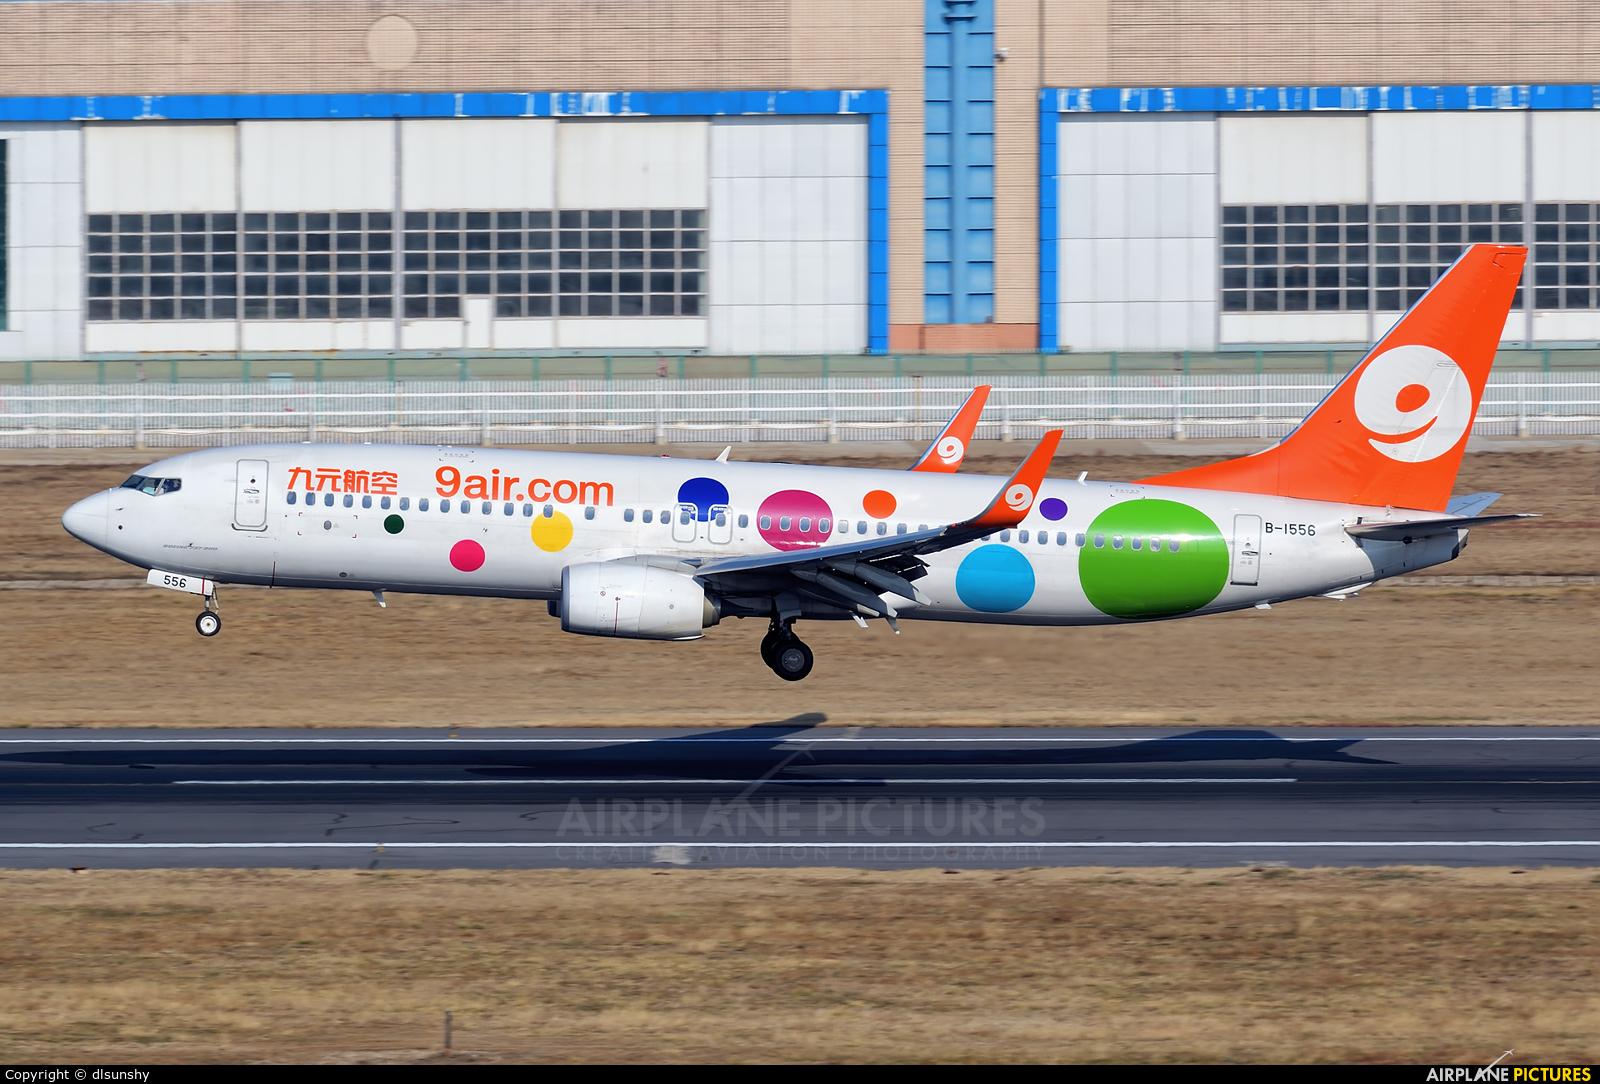 9 Air B-1556 aircraft at Dalian Zhoushuizi Int'l